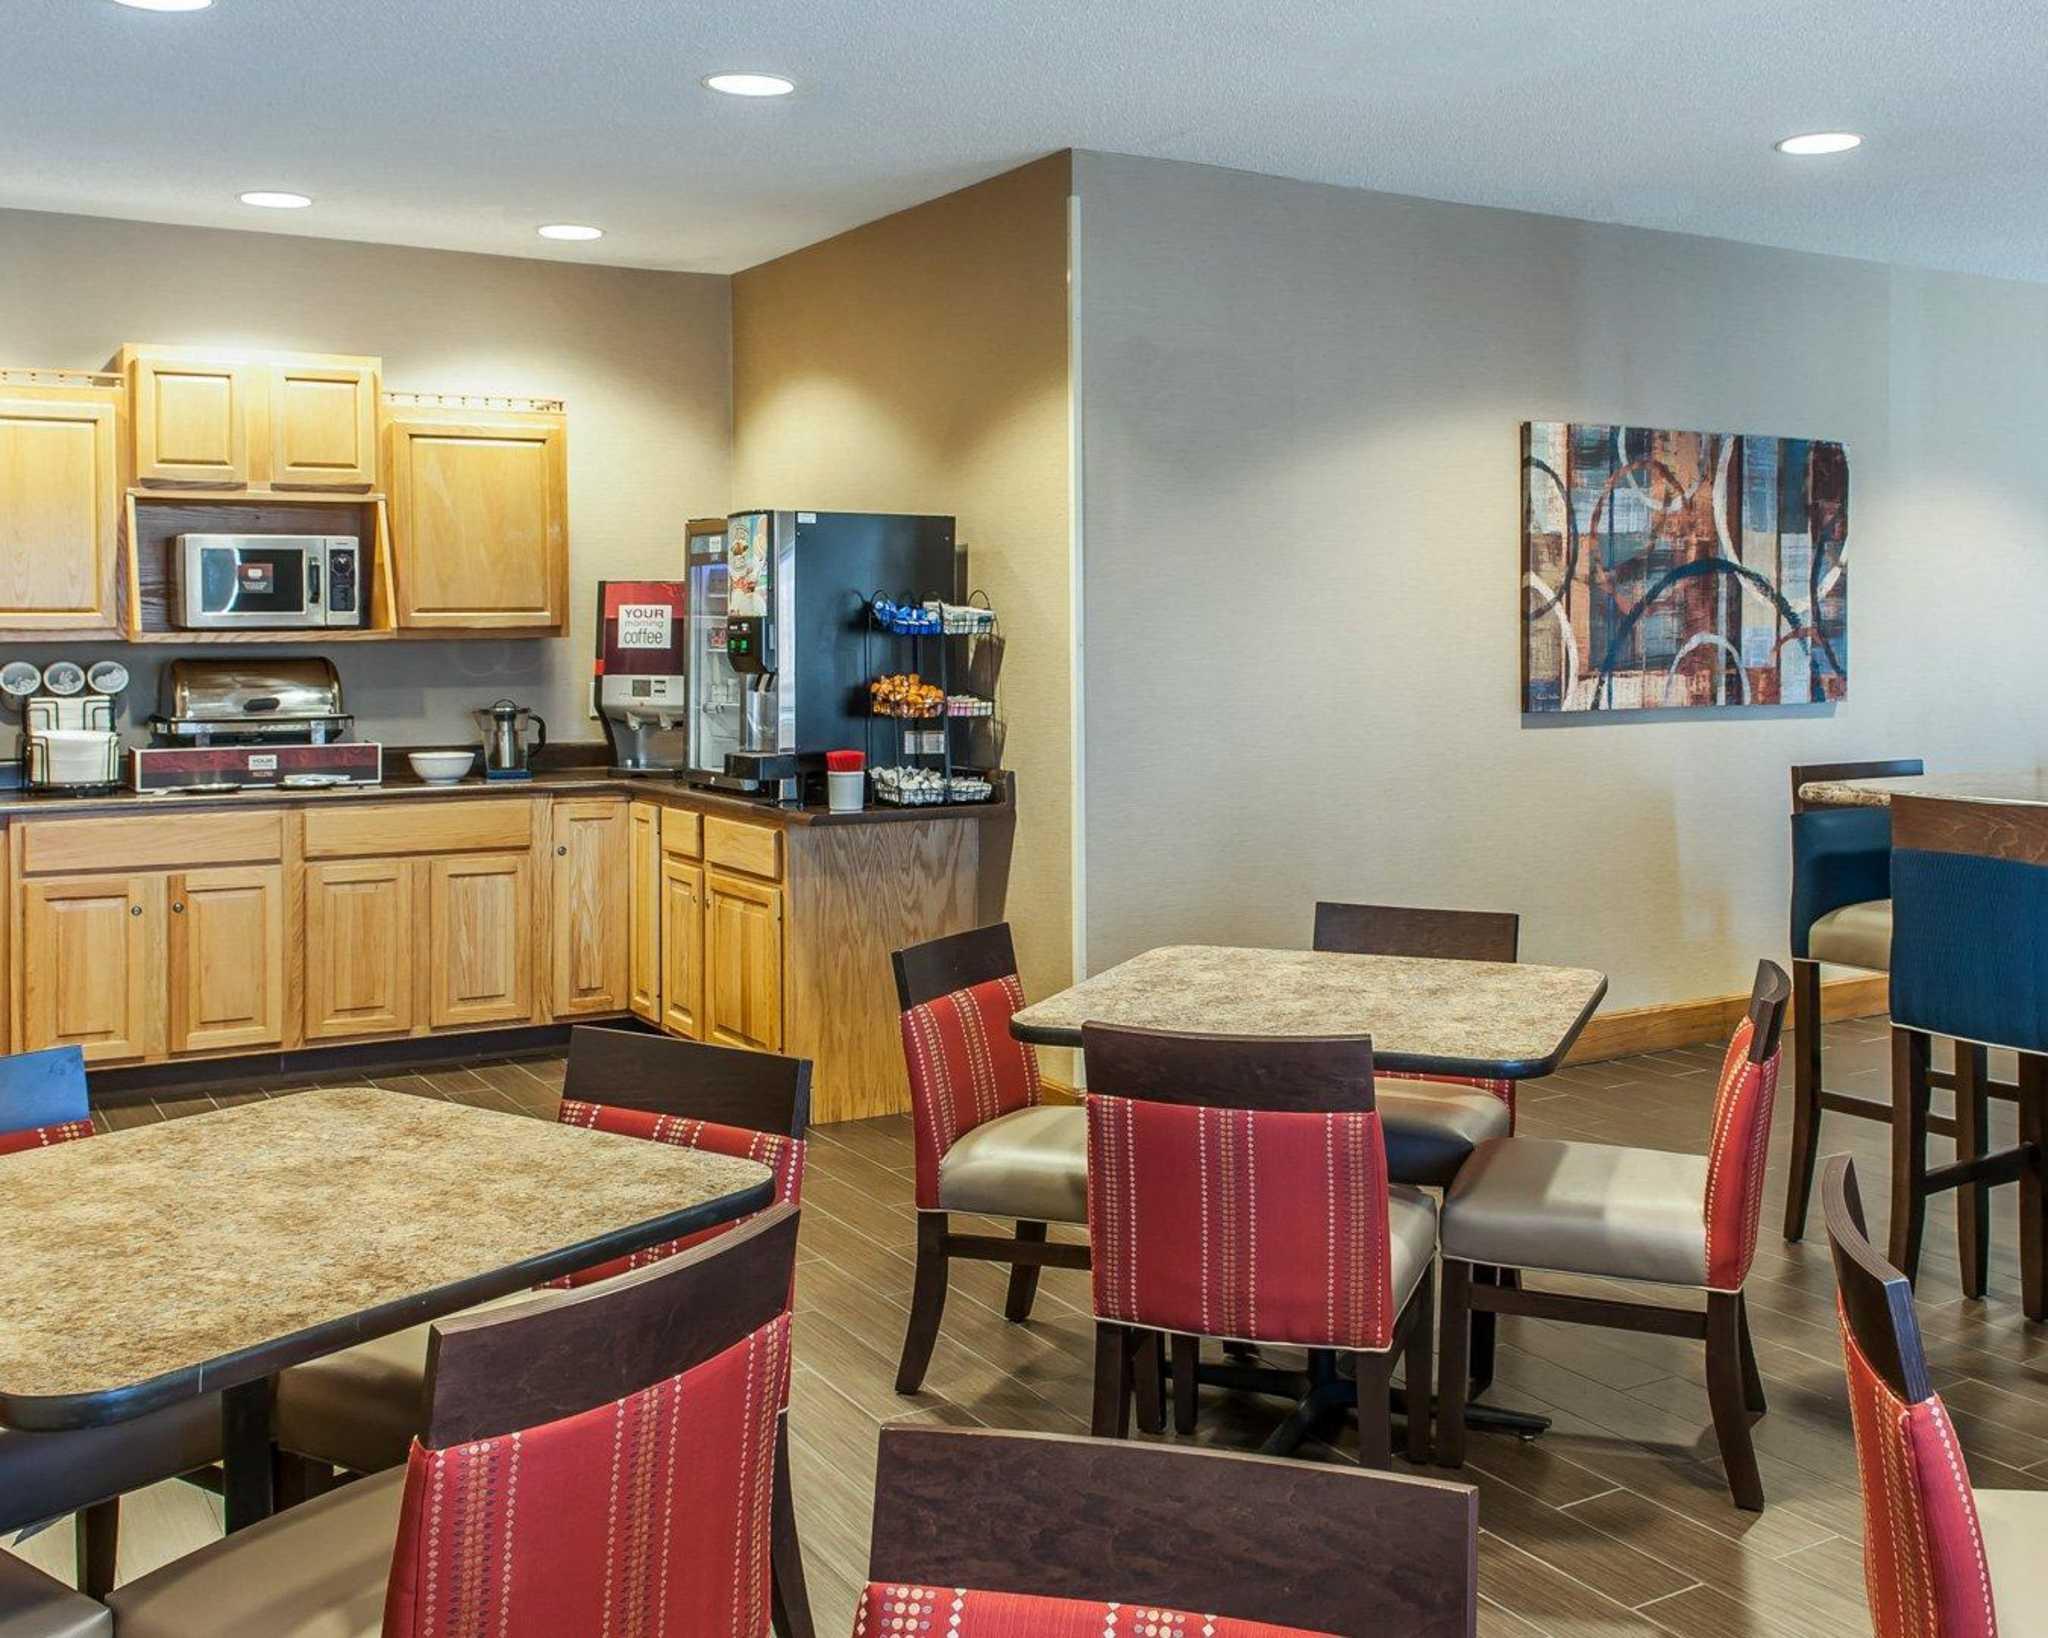 Comfort Inn Shelbyville North image 3